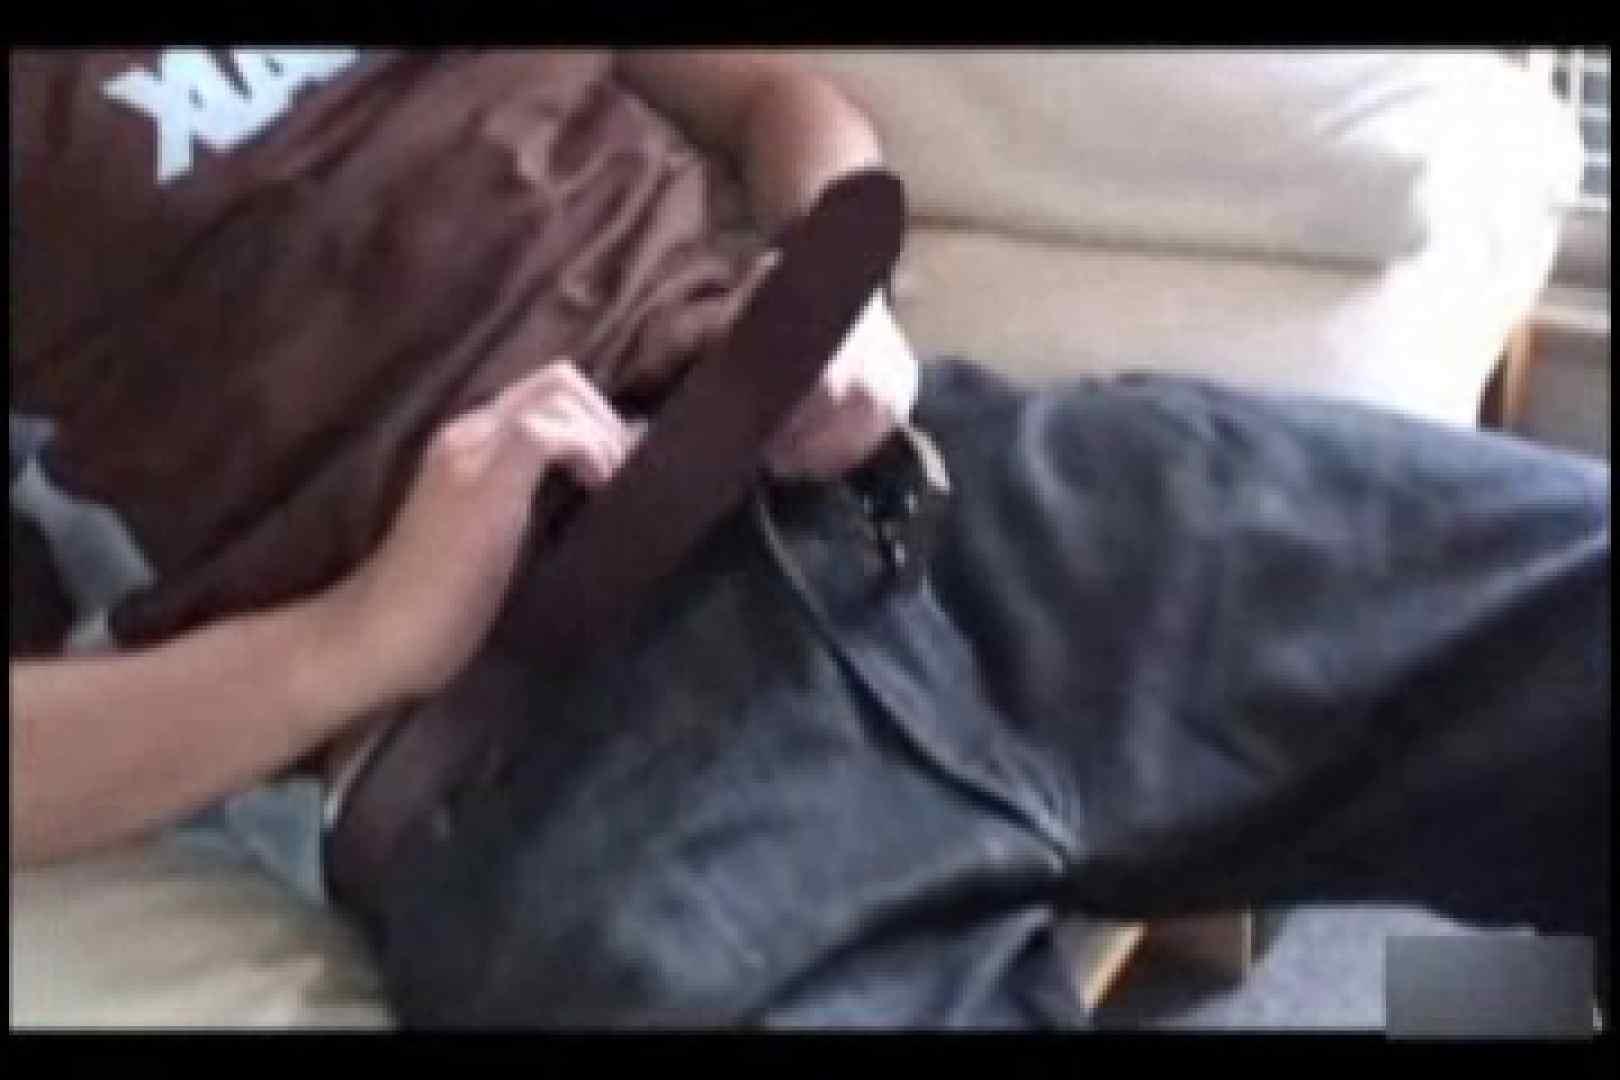 GayなDJのGay的LIFE!!その2 射精シーン   ディルドで絶頂 GAY無修正エロ動画 89pic 26